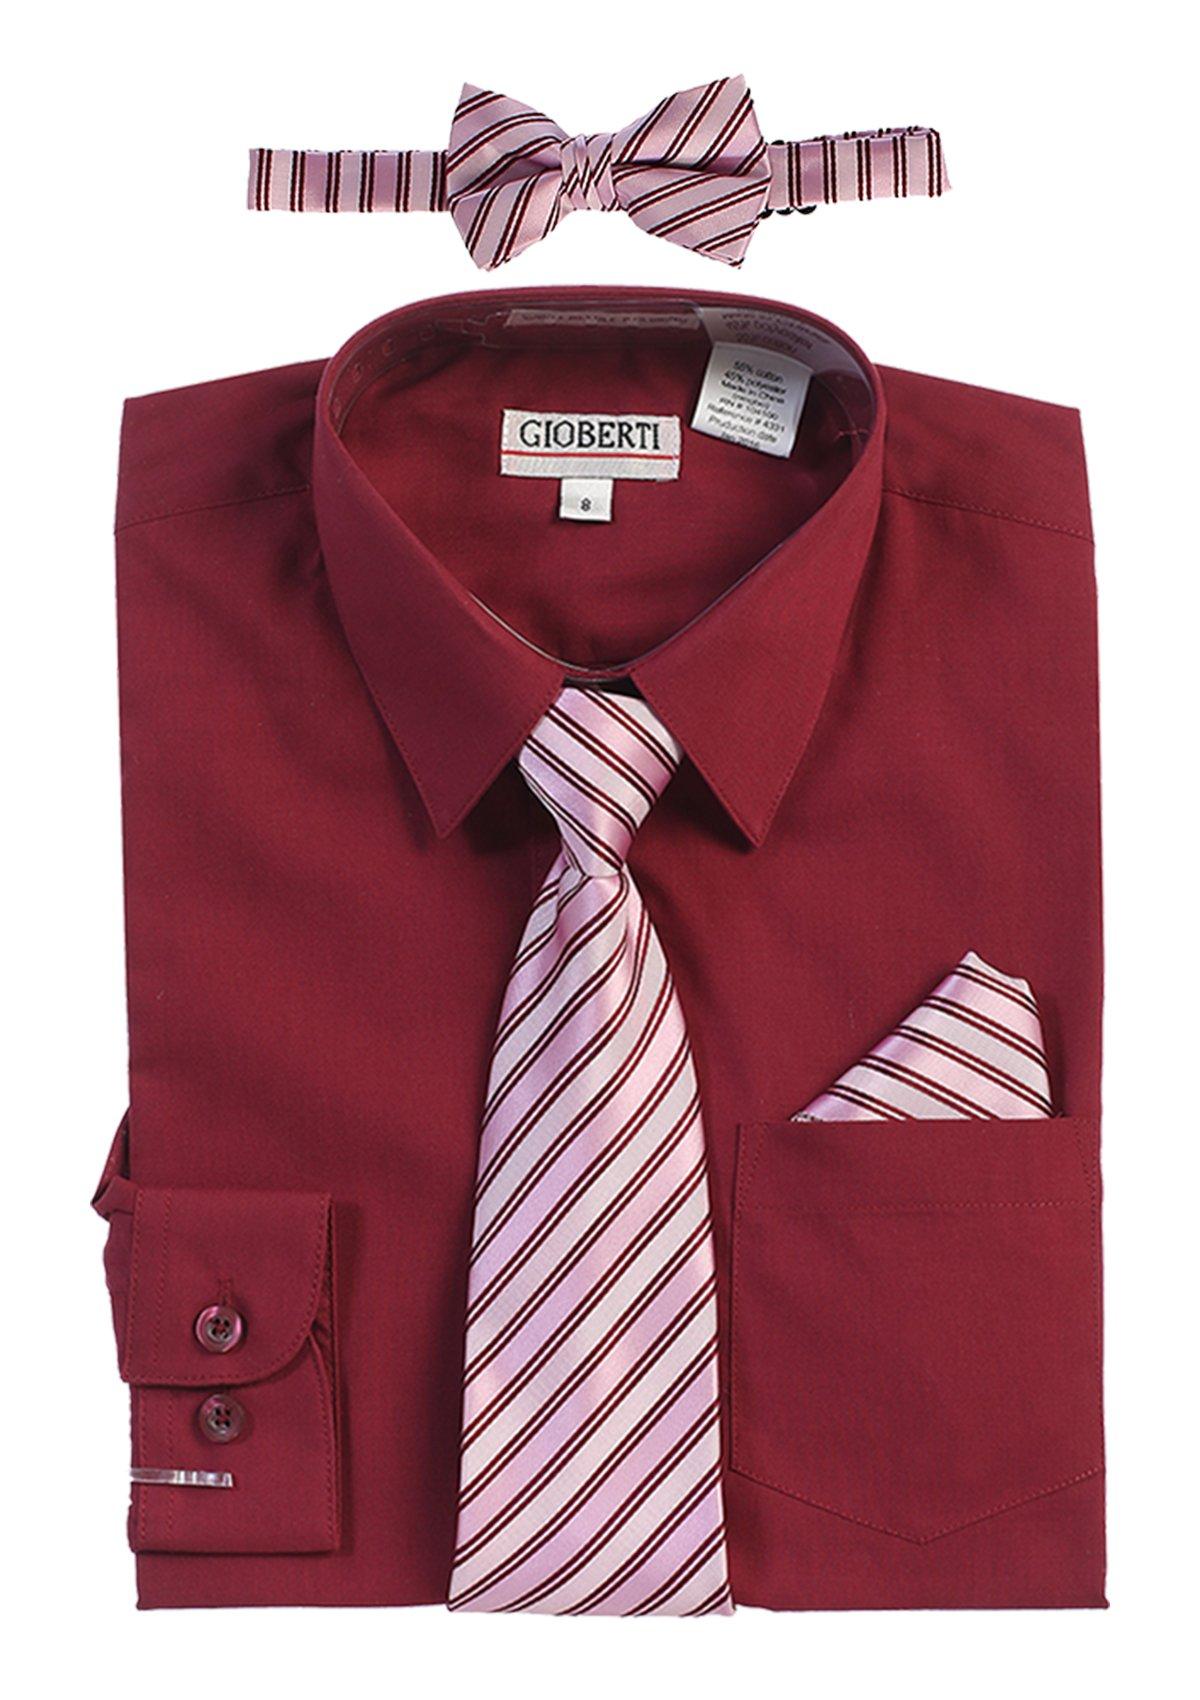 Gioberti Boy's Long Sleeve Dress Shirt and Stripe Zippered Tie Set, Burgundy, Size 14